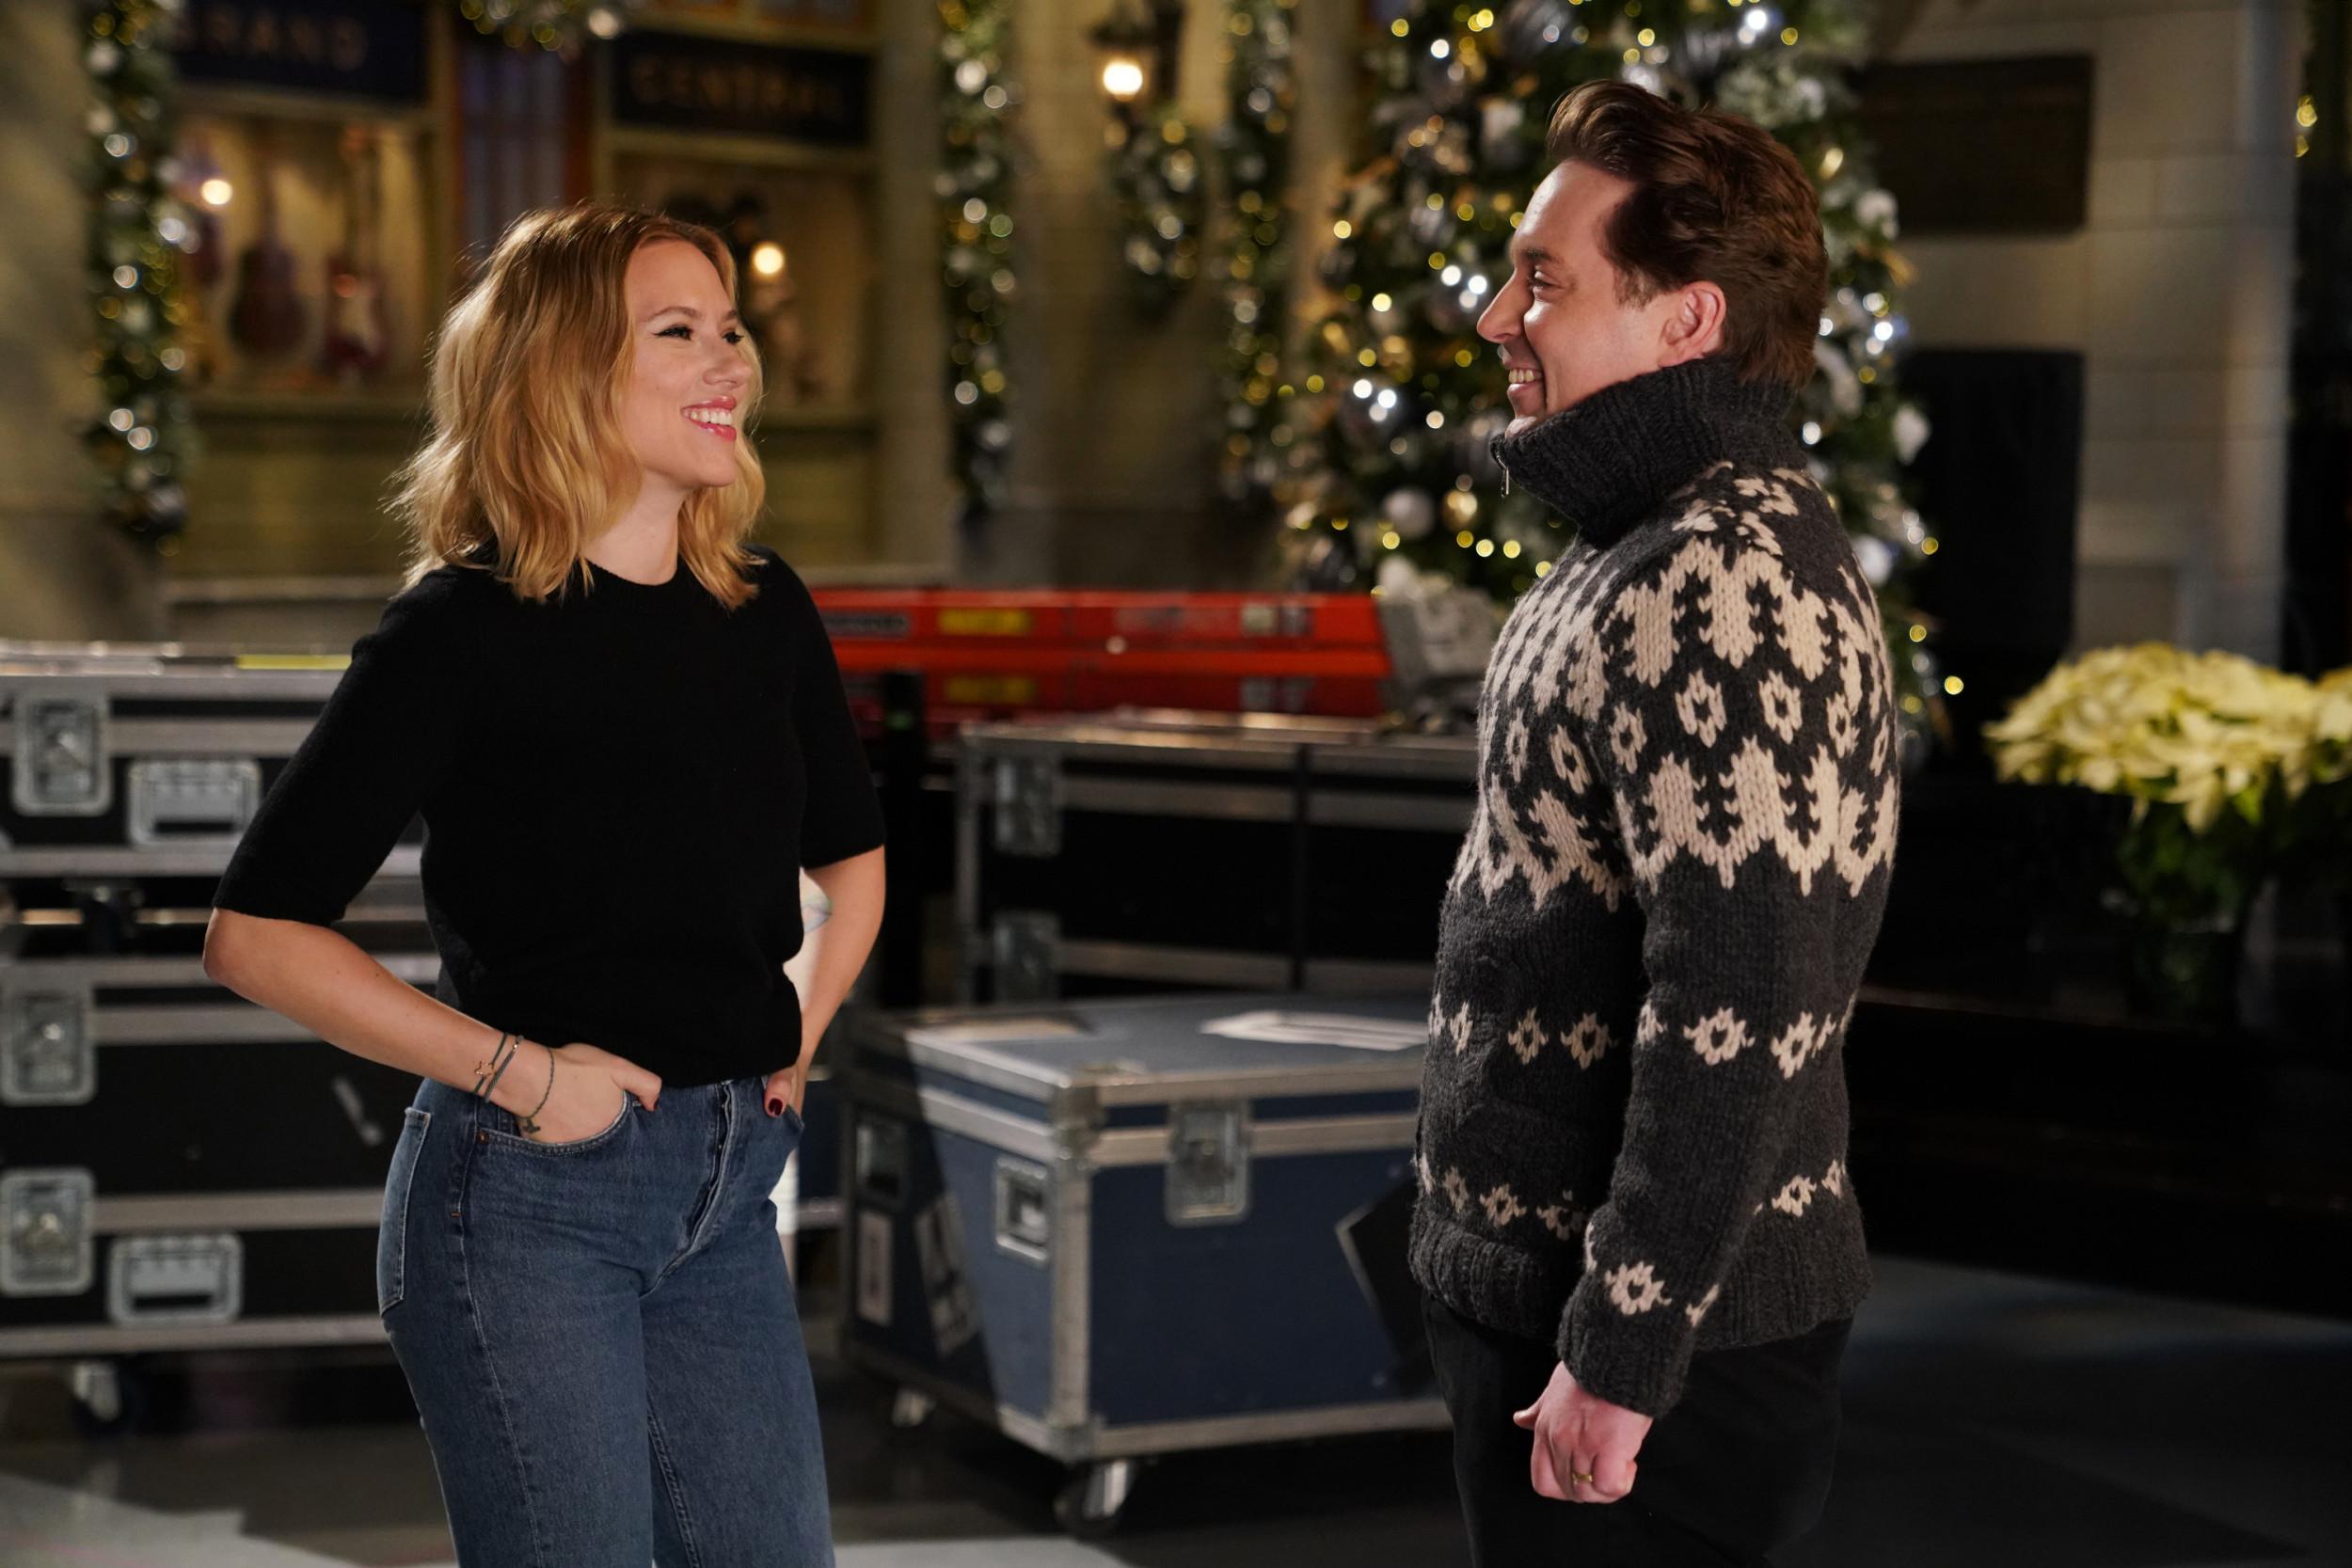 Is Snl On Tonight Watch Scarlett Johansson Host Saturday Night Live